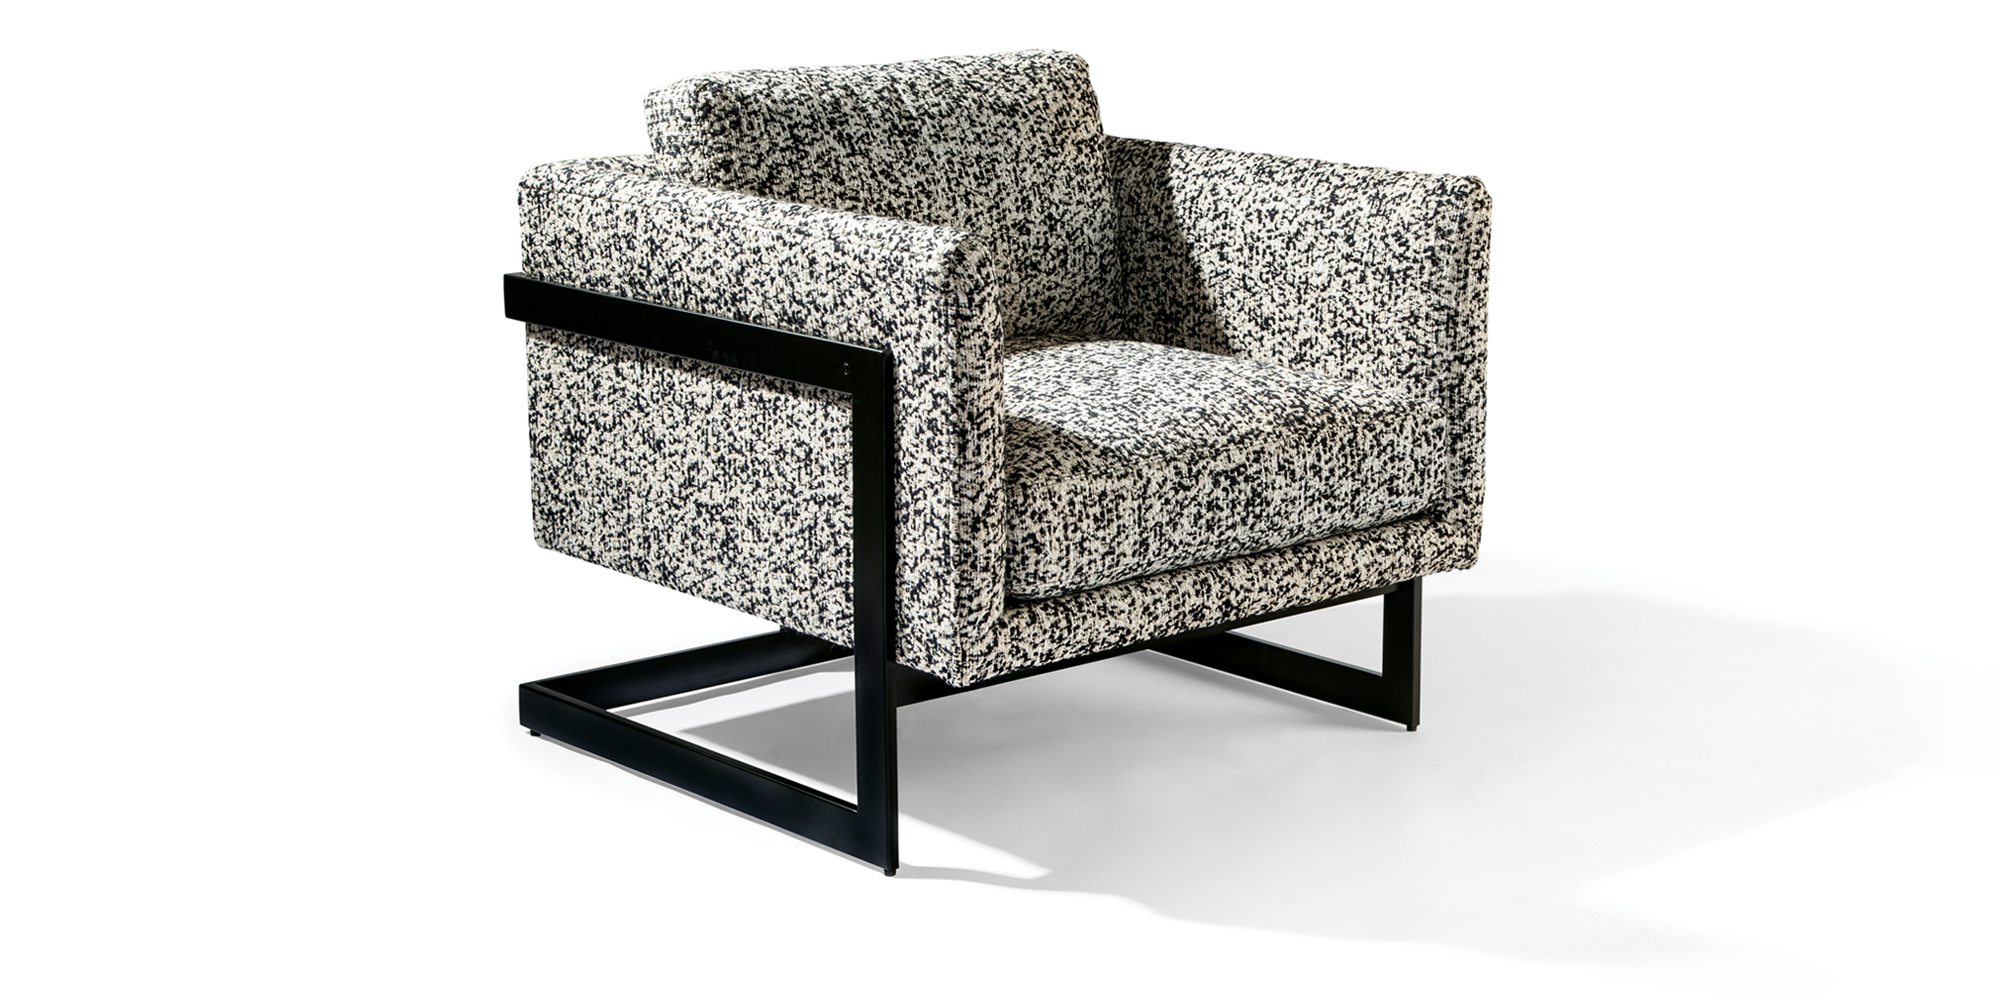 989 Design Classic Lounge Chair (Noir Finish)